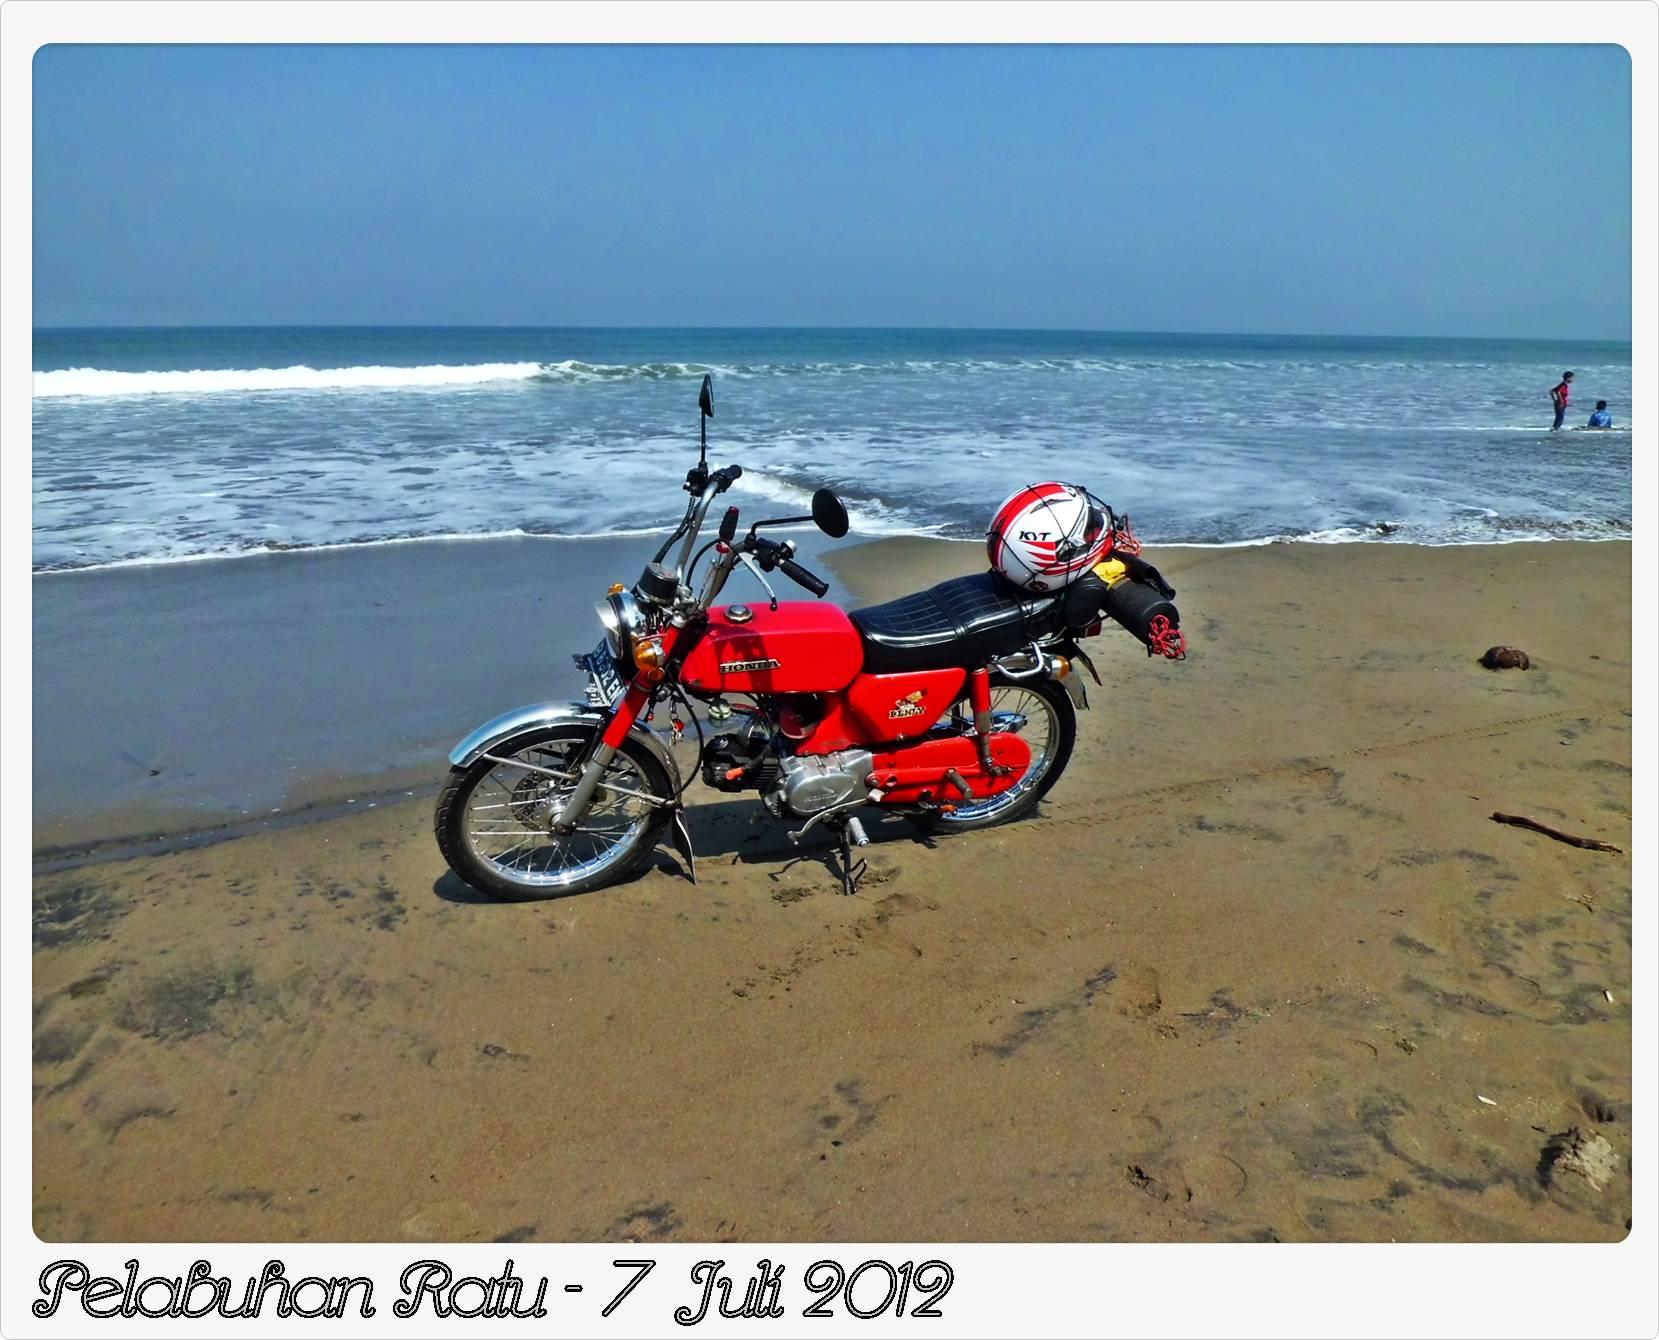 sonnykdn - Classic Bike at the Beach